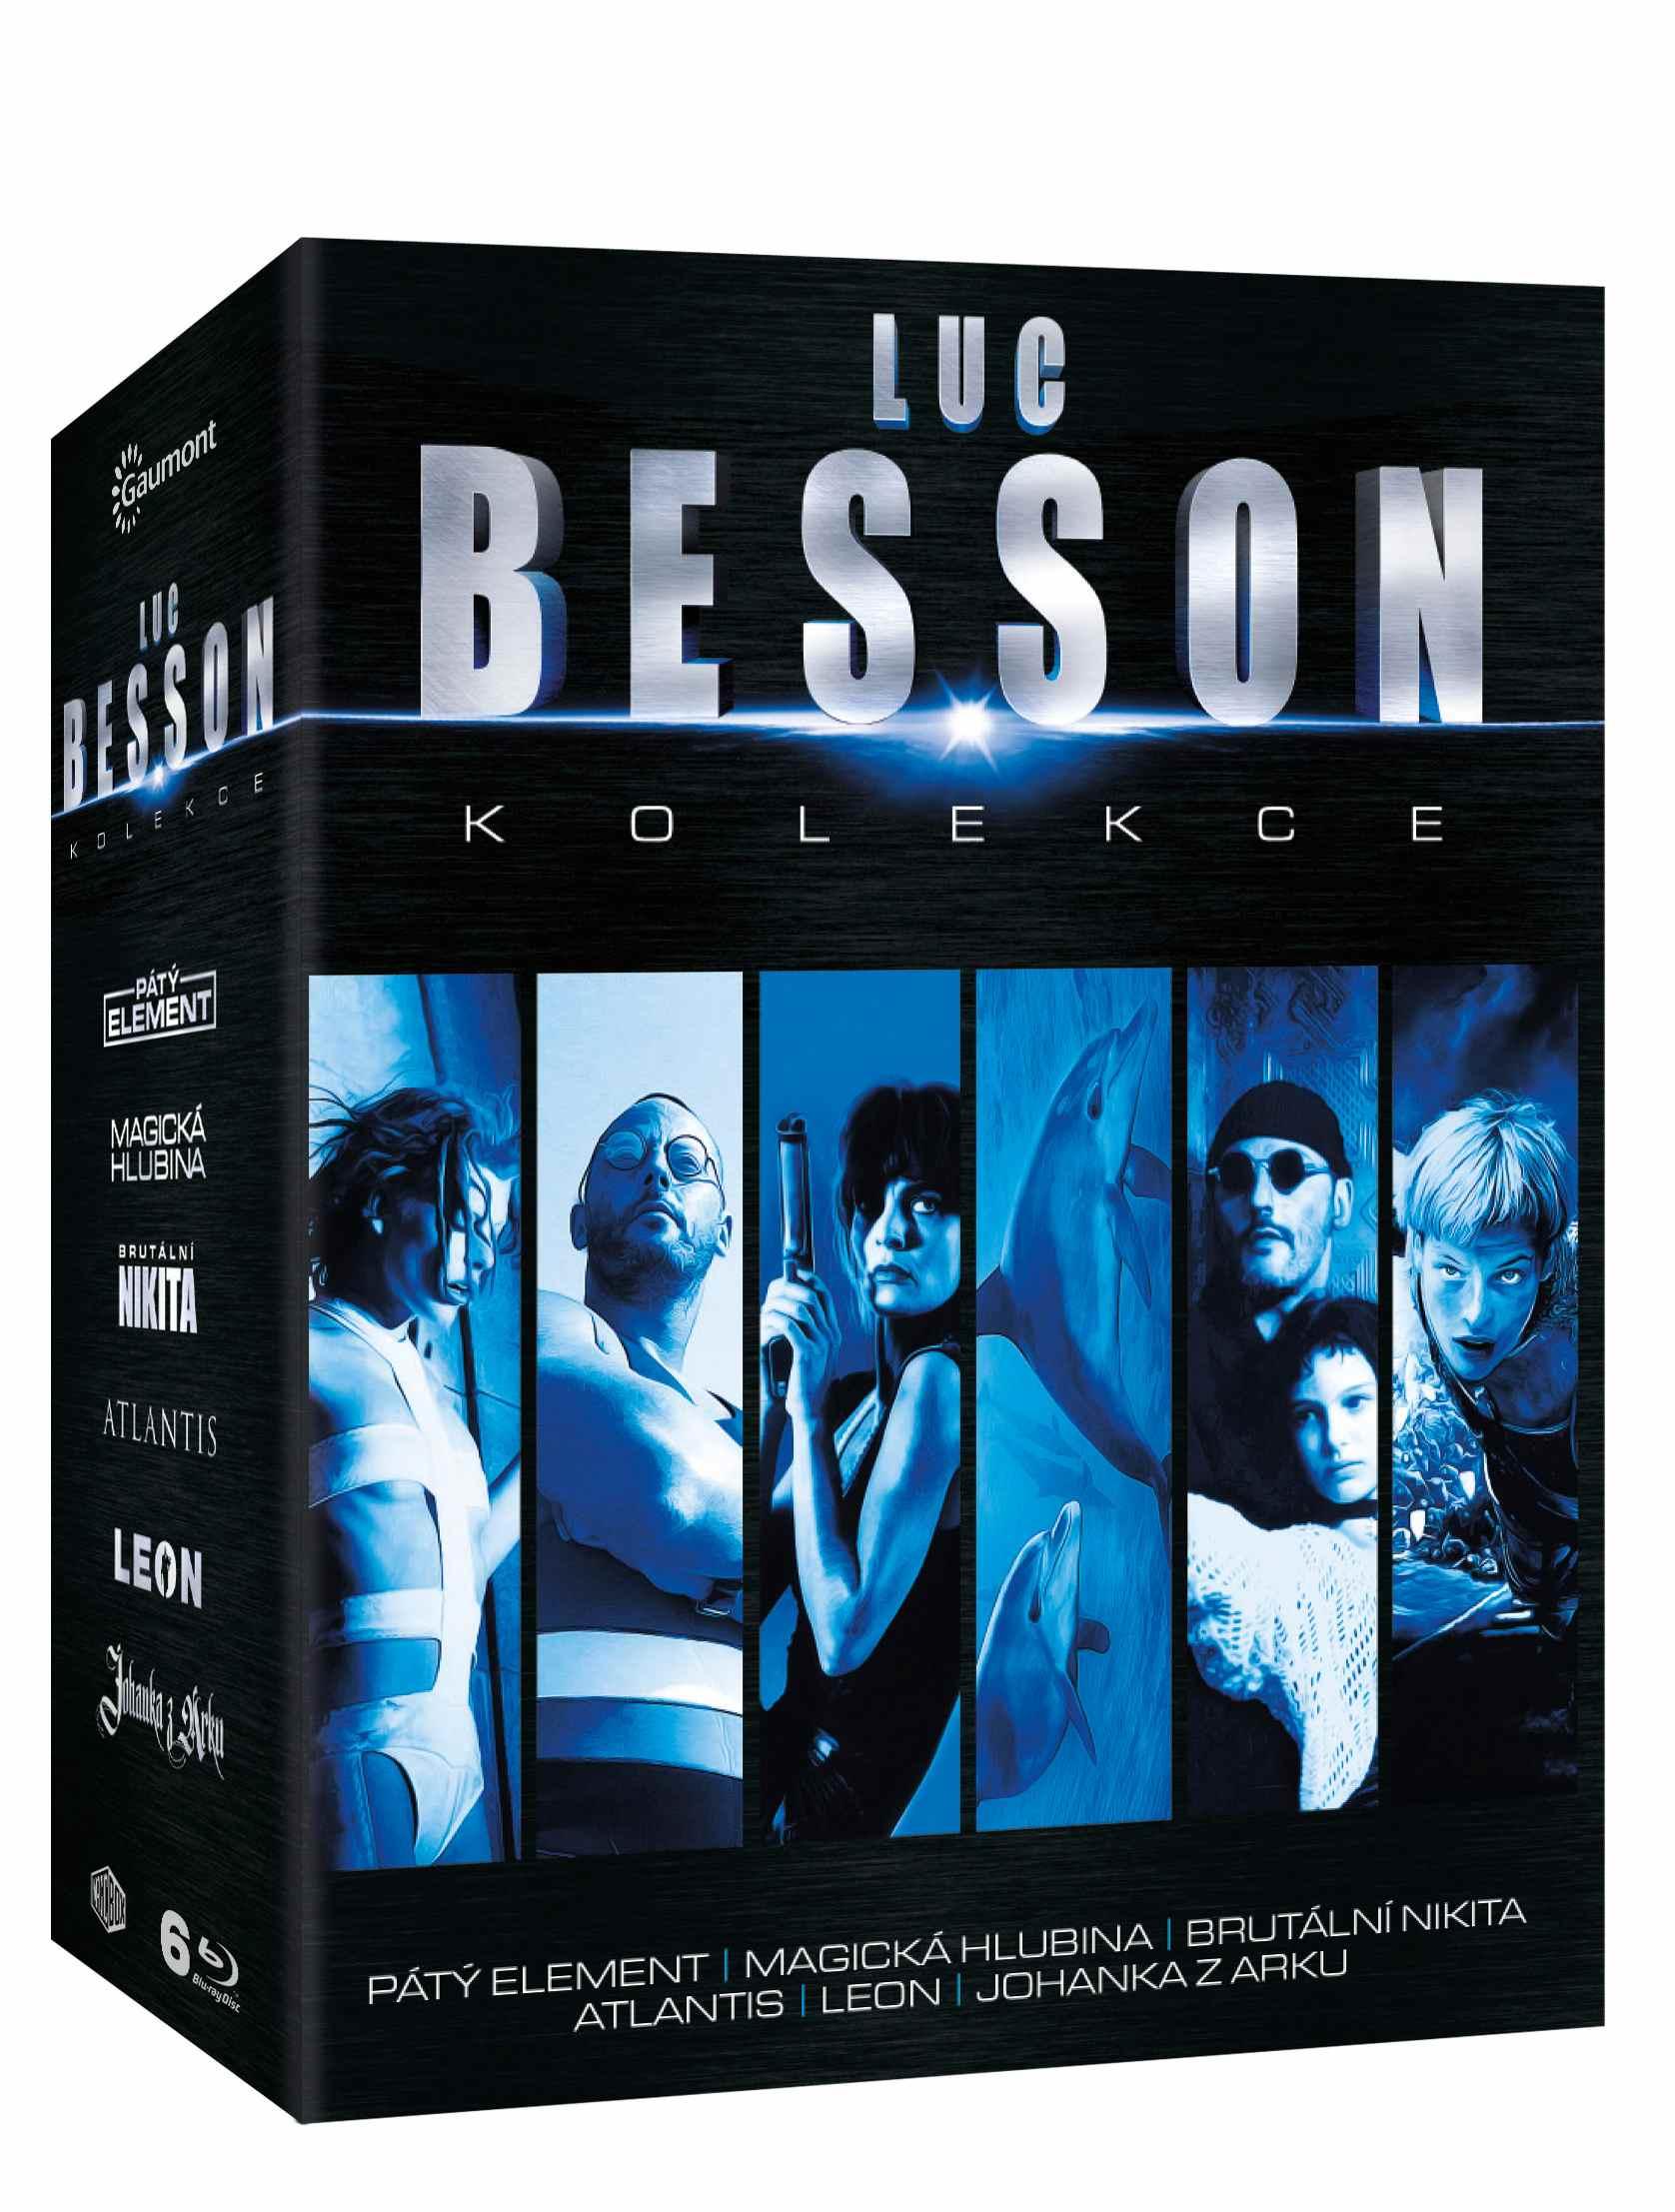 LUC BESSON KOLEKCE (6 BD) - Blu-ray